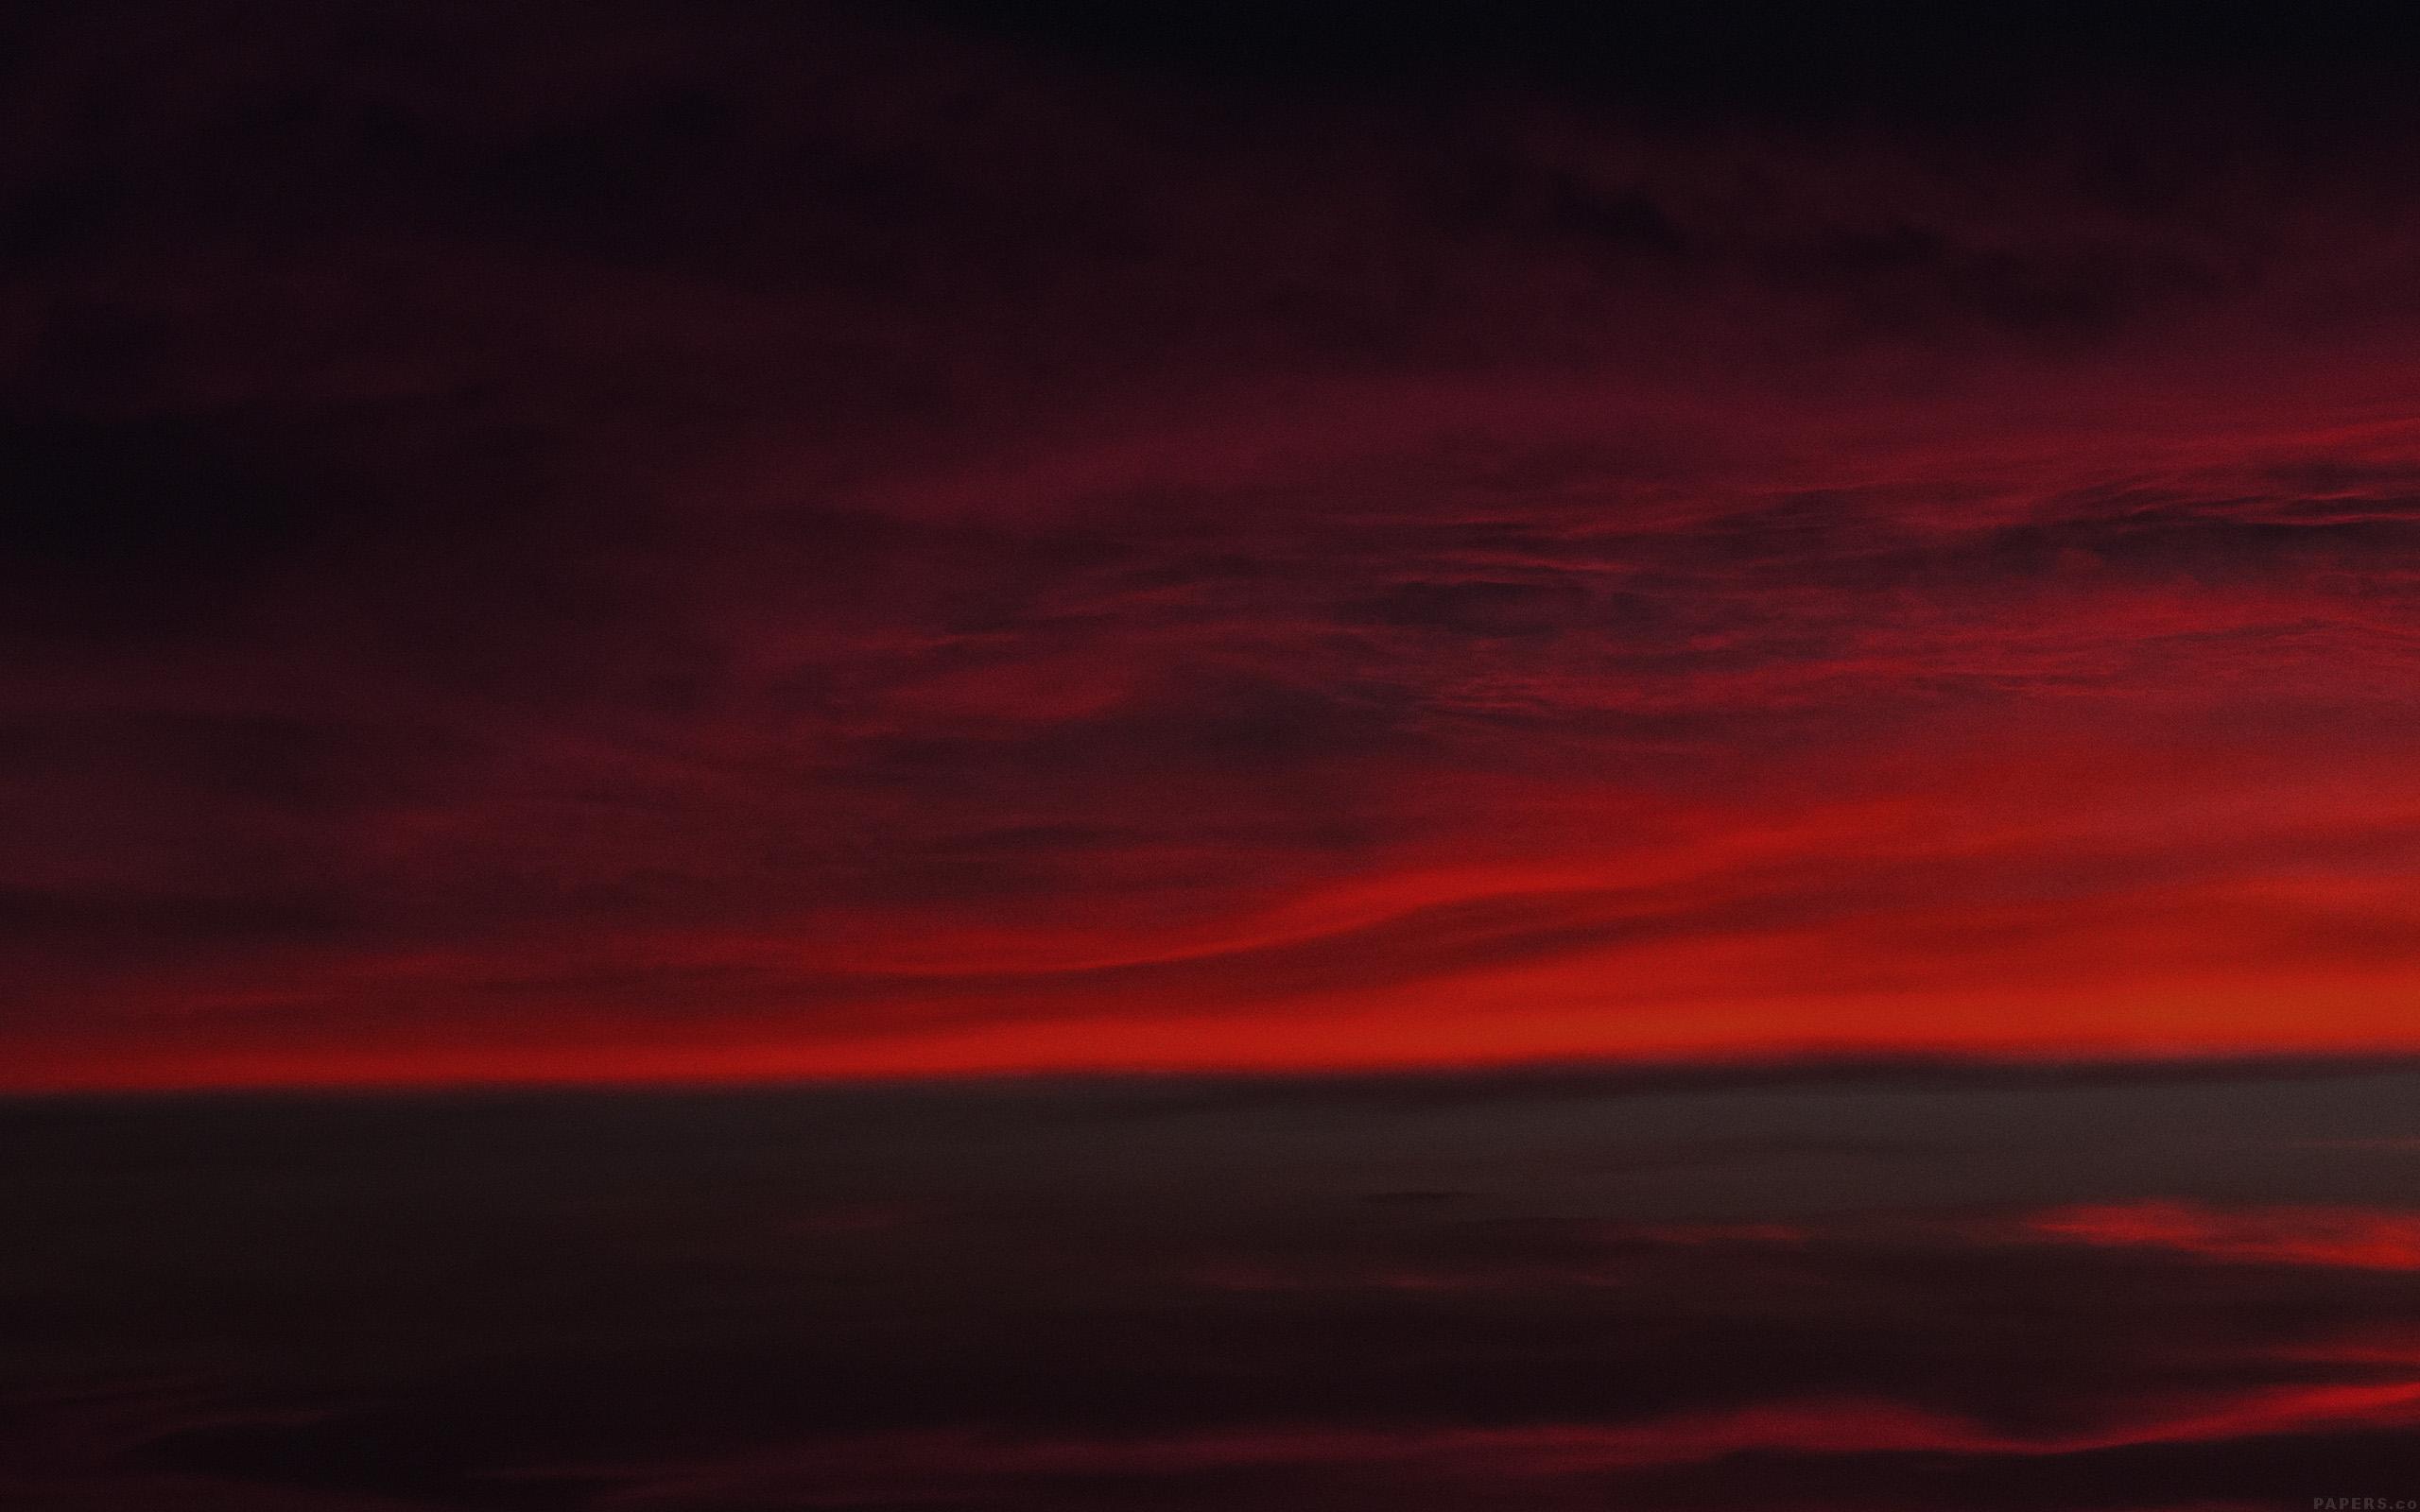 Hd Car Wallpapers Mi69 Lotus Carroll Red Sky Was Falling Cloud Nature